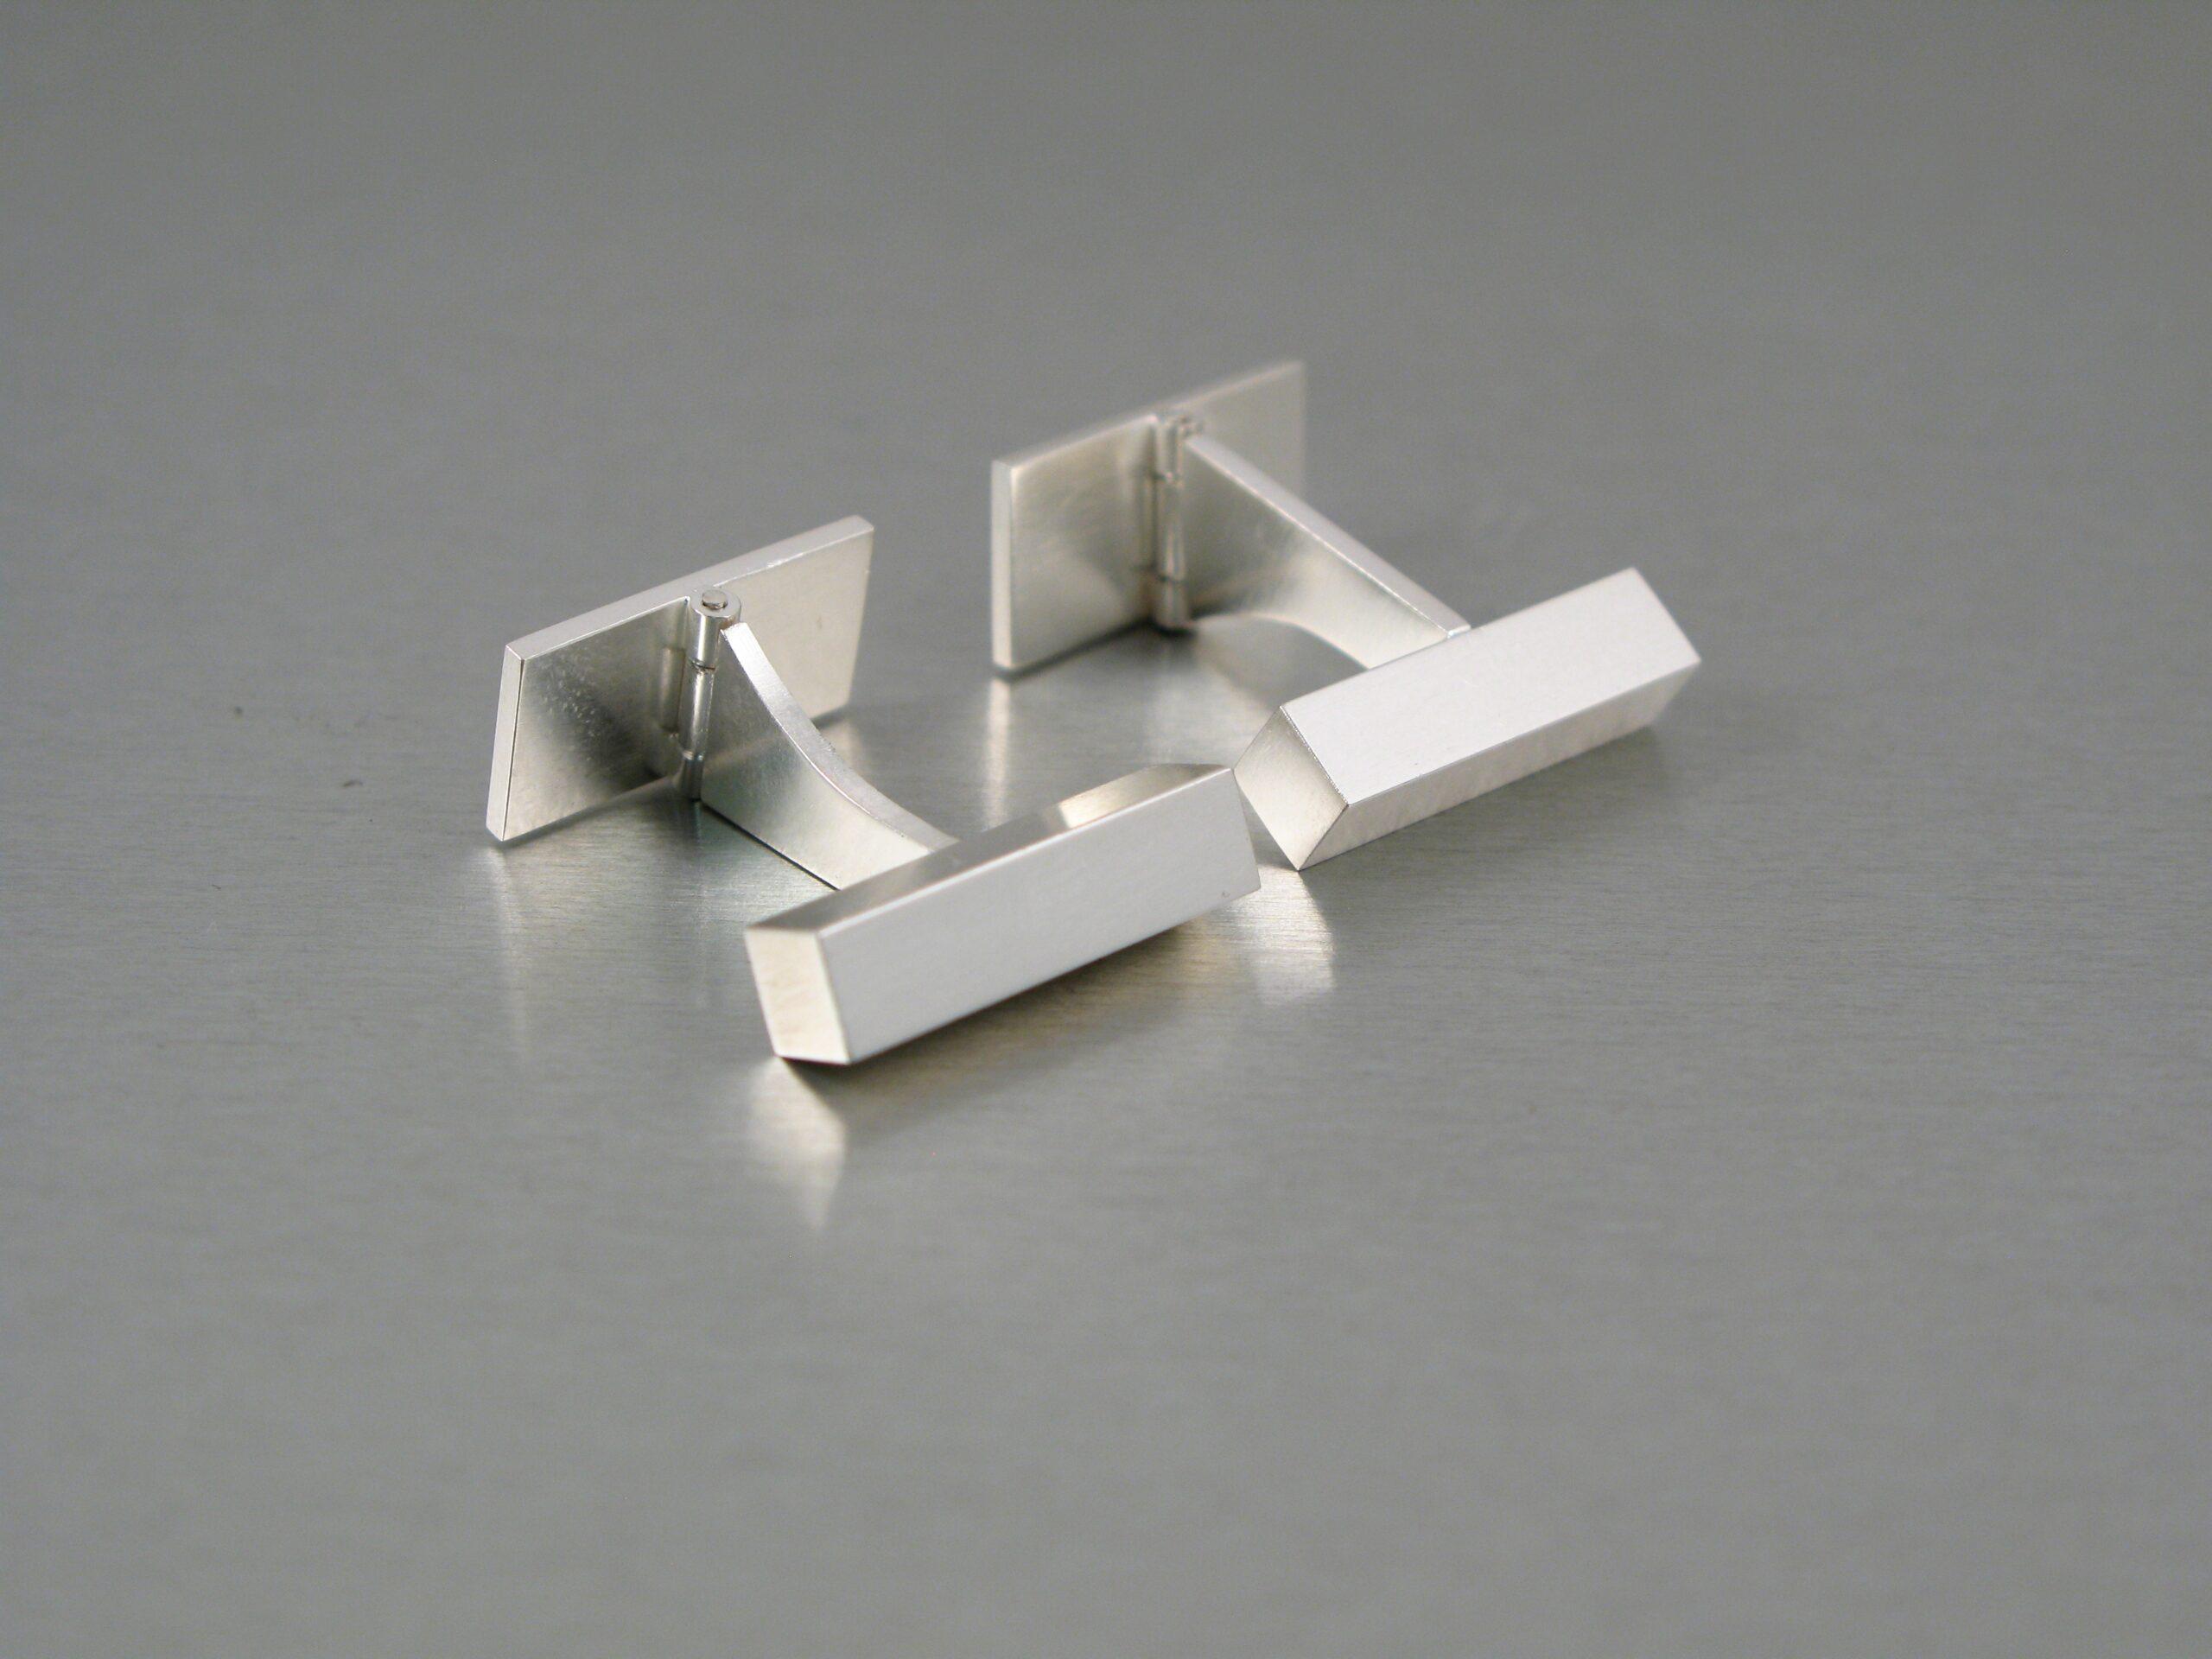 Manschettknappar, silver.